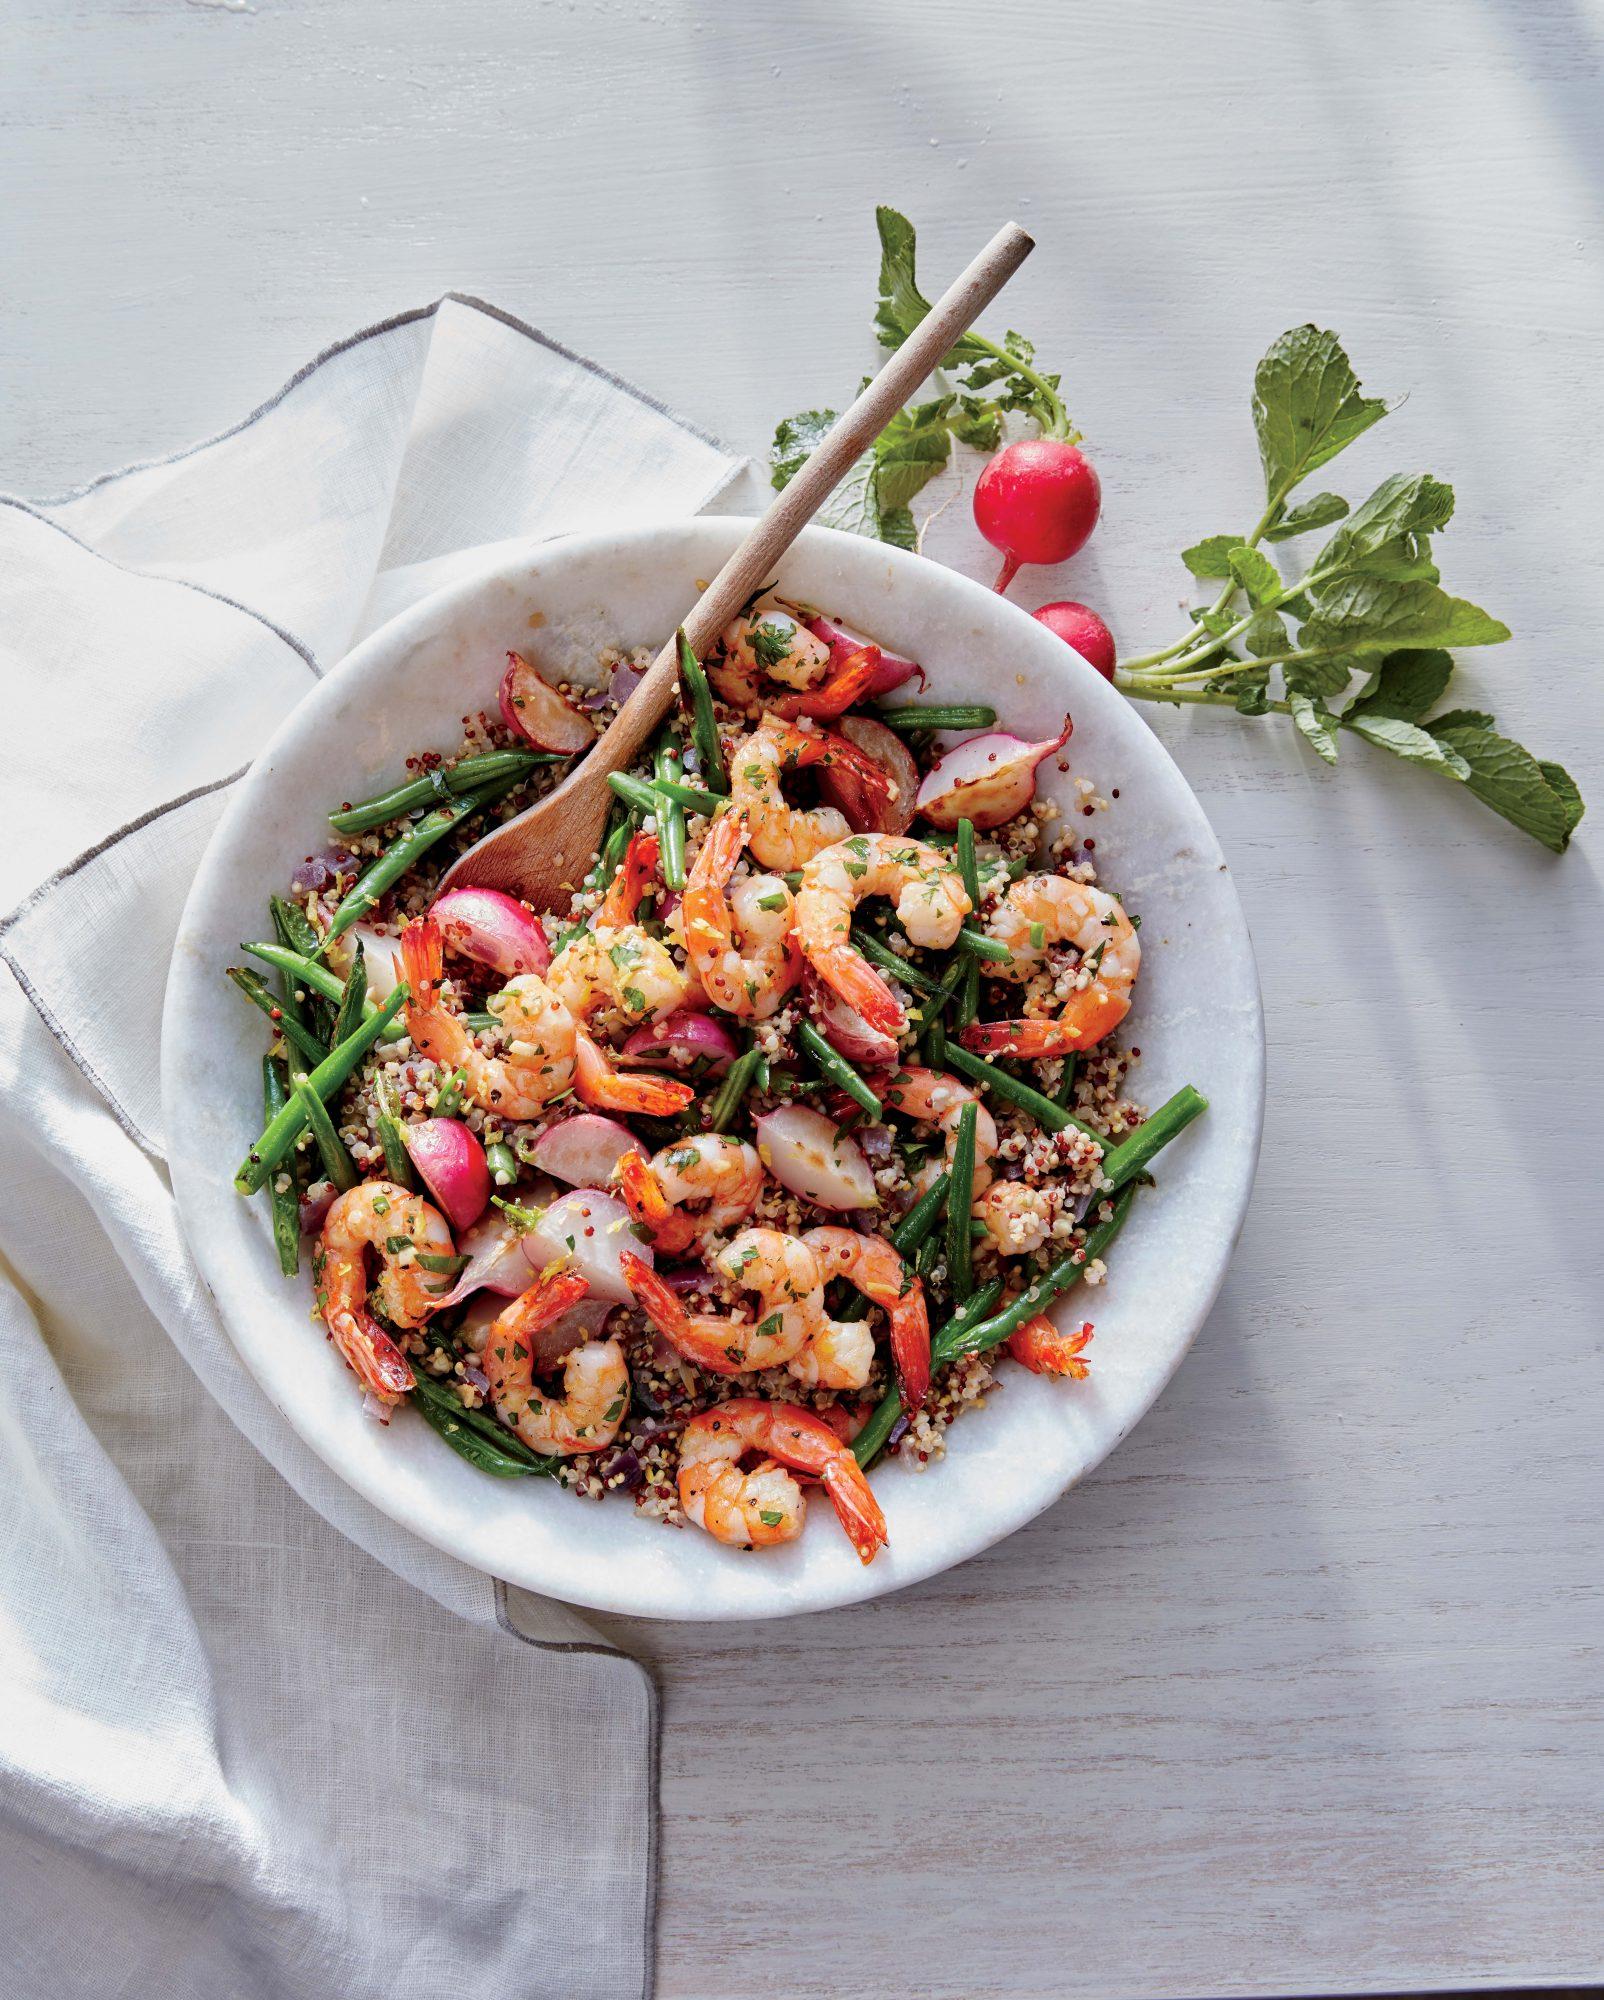 Lemon-Garlic Shrimp with Radish and Green Bean Quinoa Image